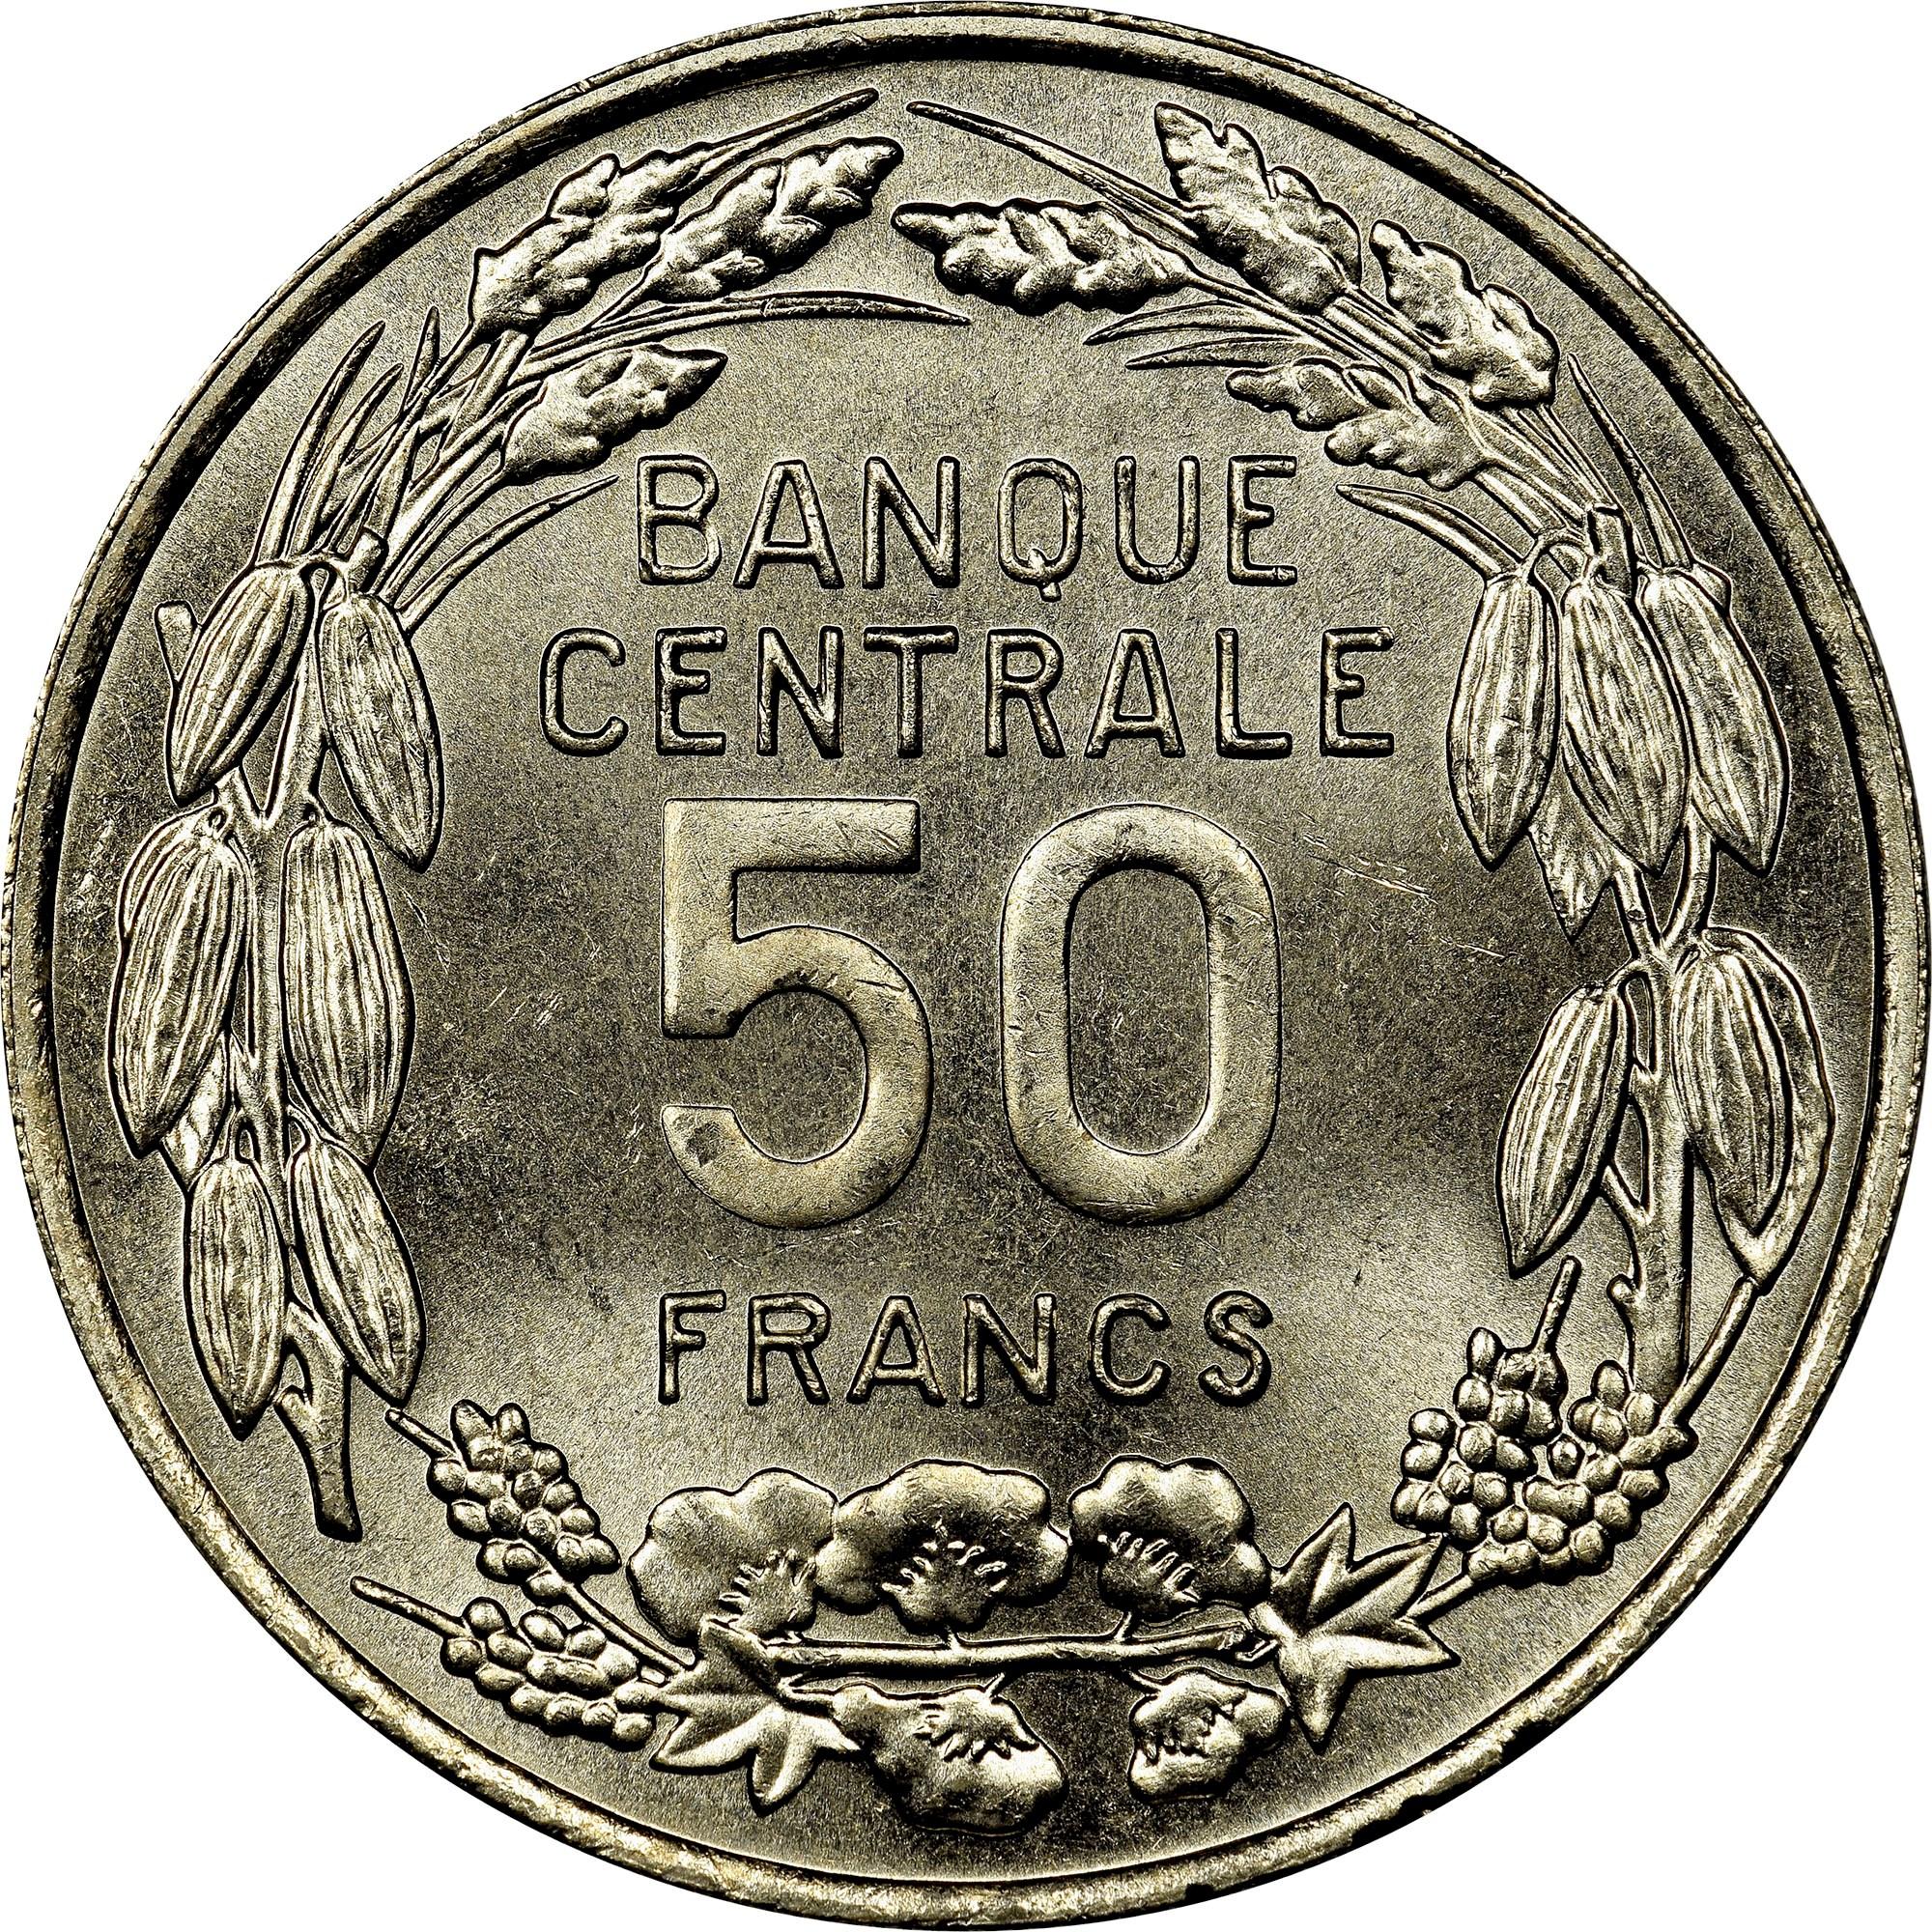 Cameroon 50 Francs reverse